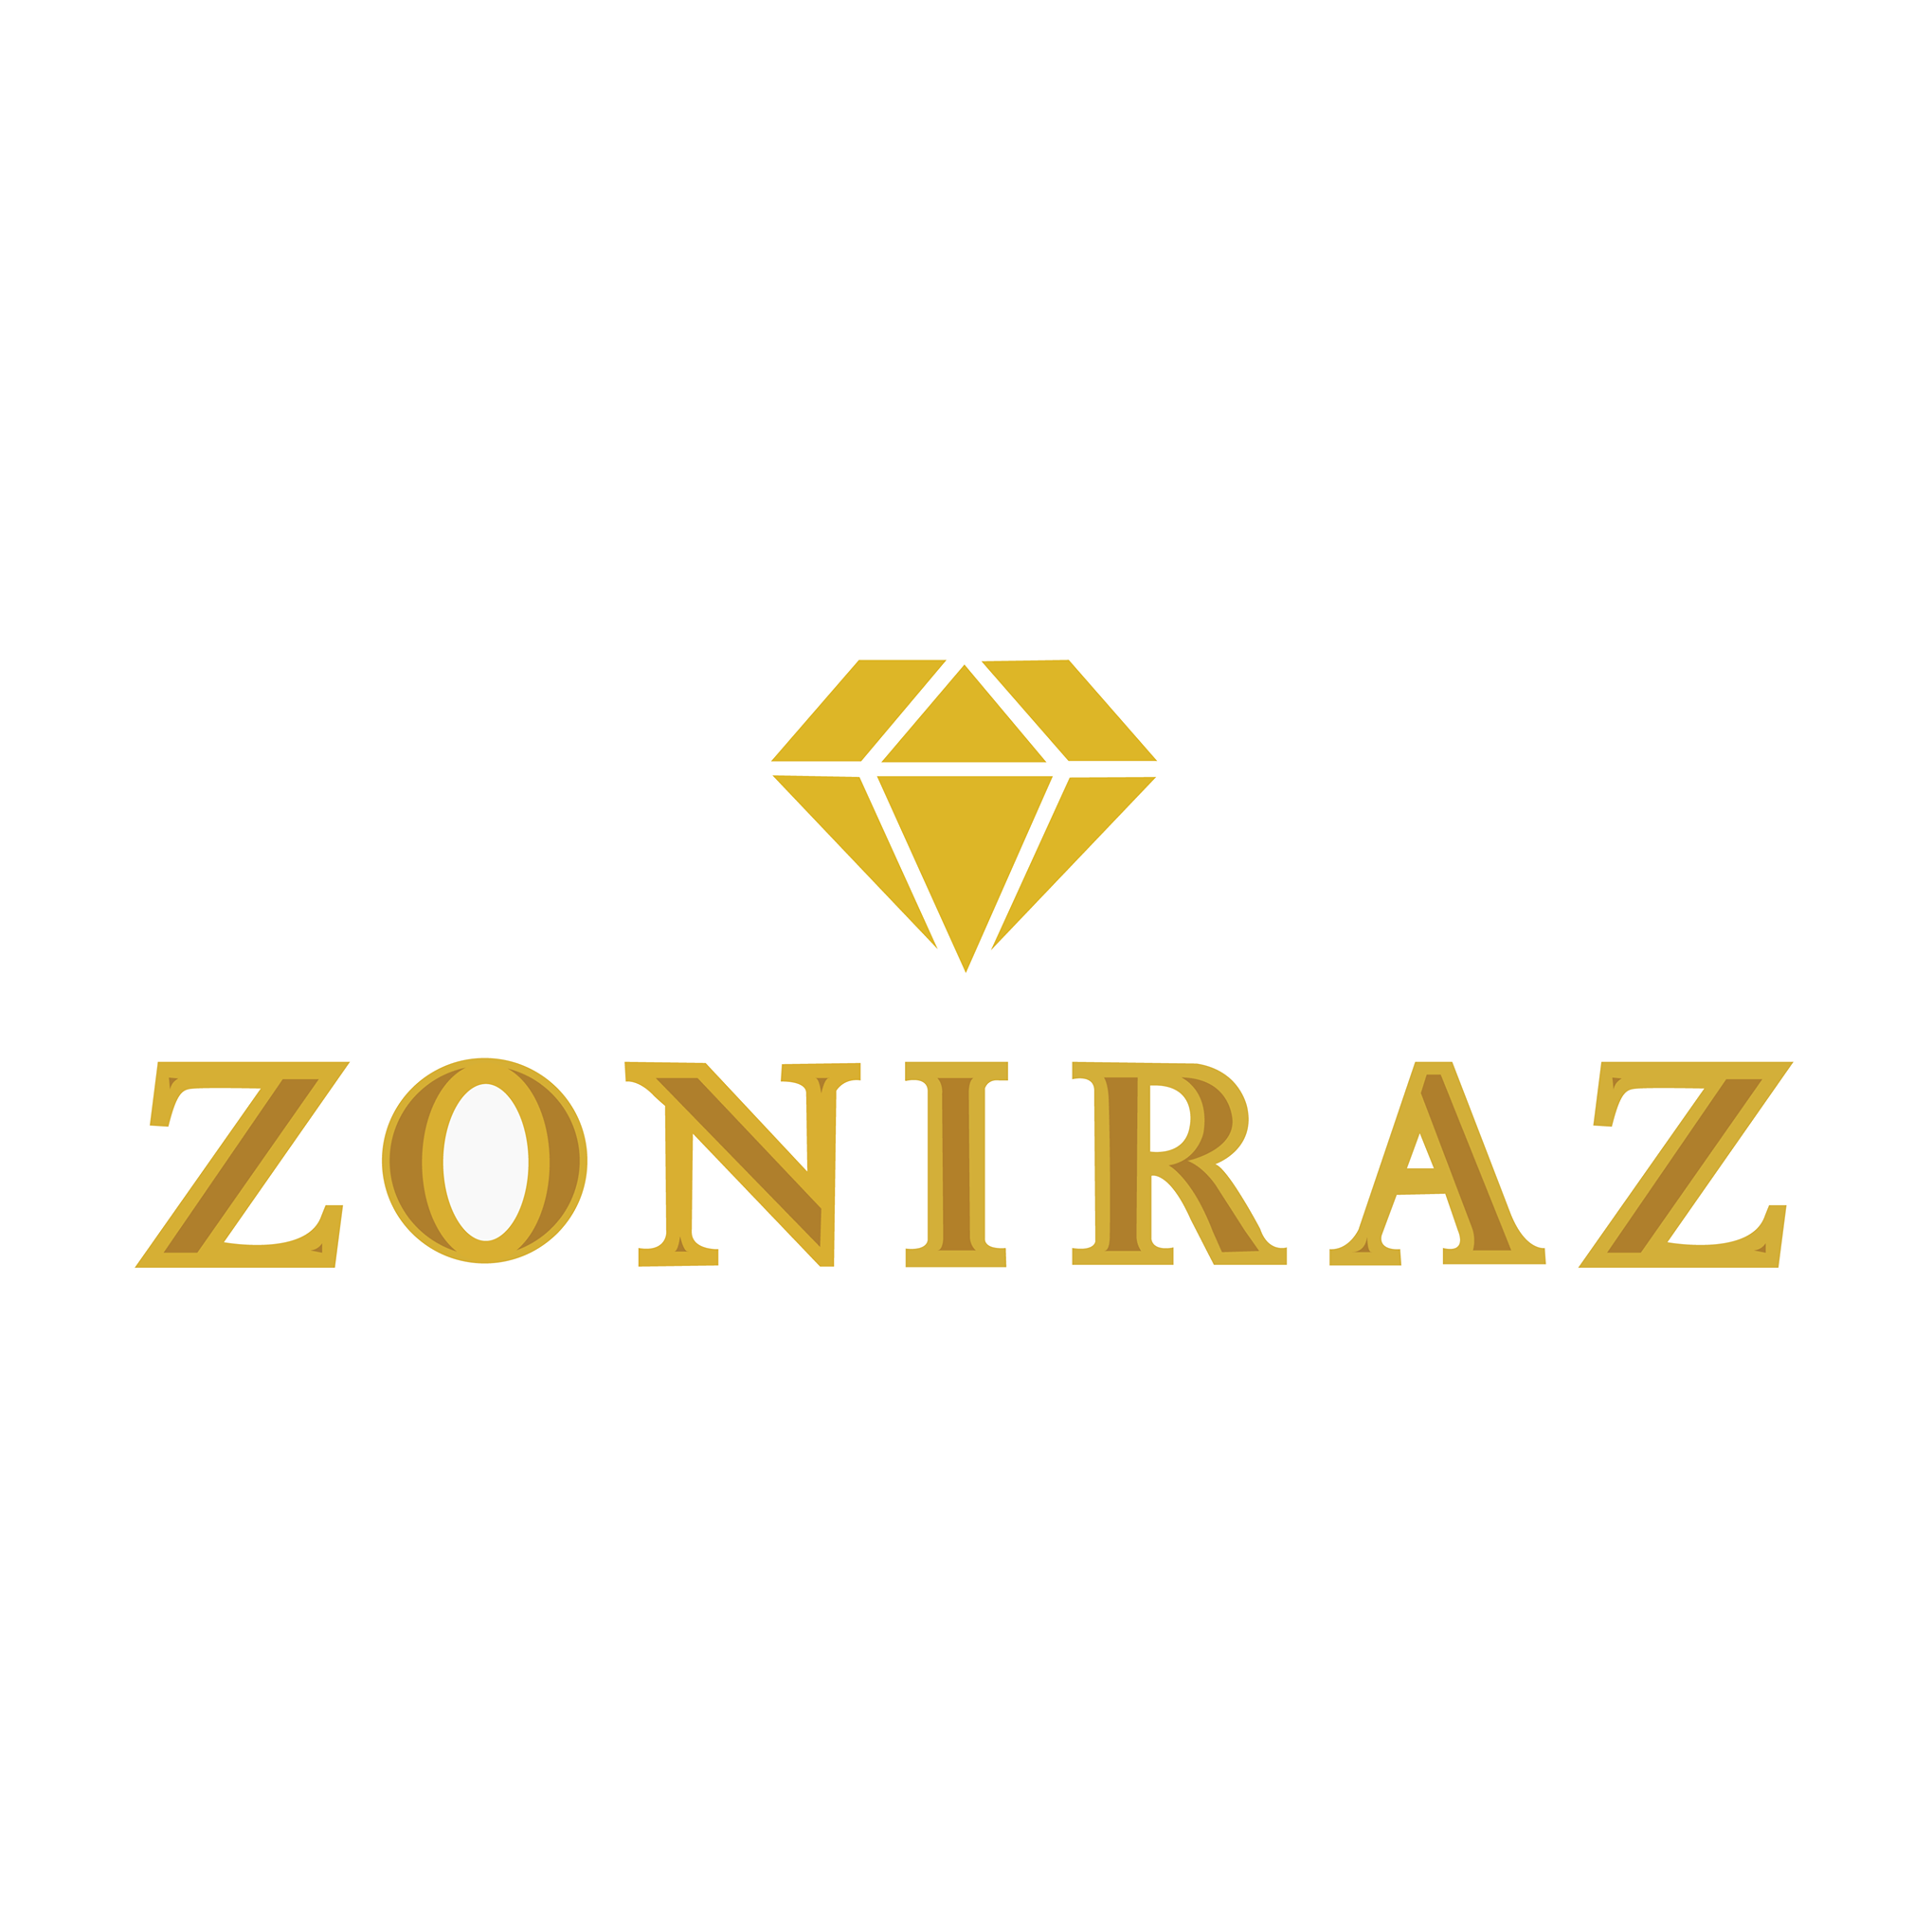 Zoniraz, Alwar, Buy Rings Online, Buy Pendants Online, Buy Earrings Online